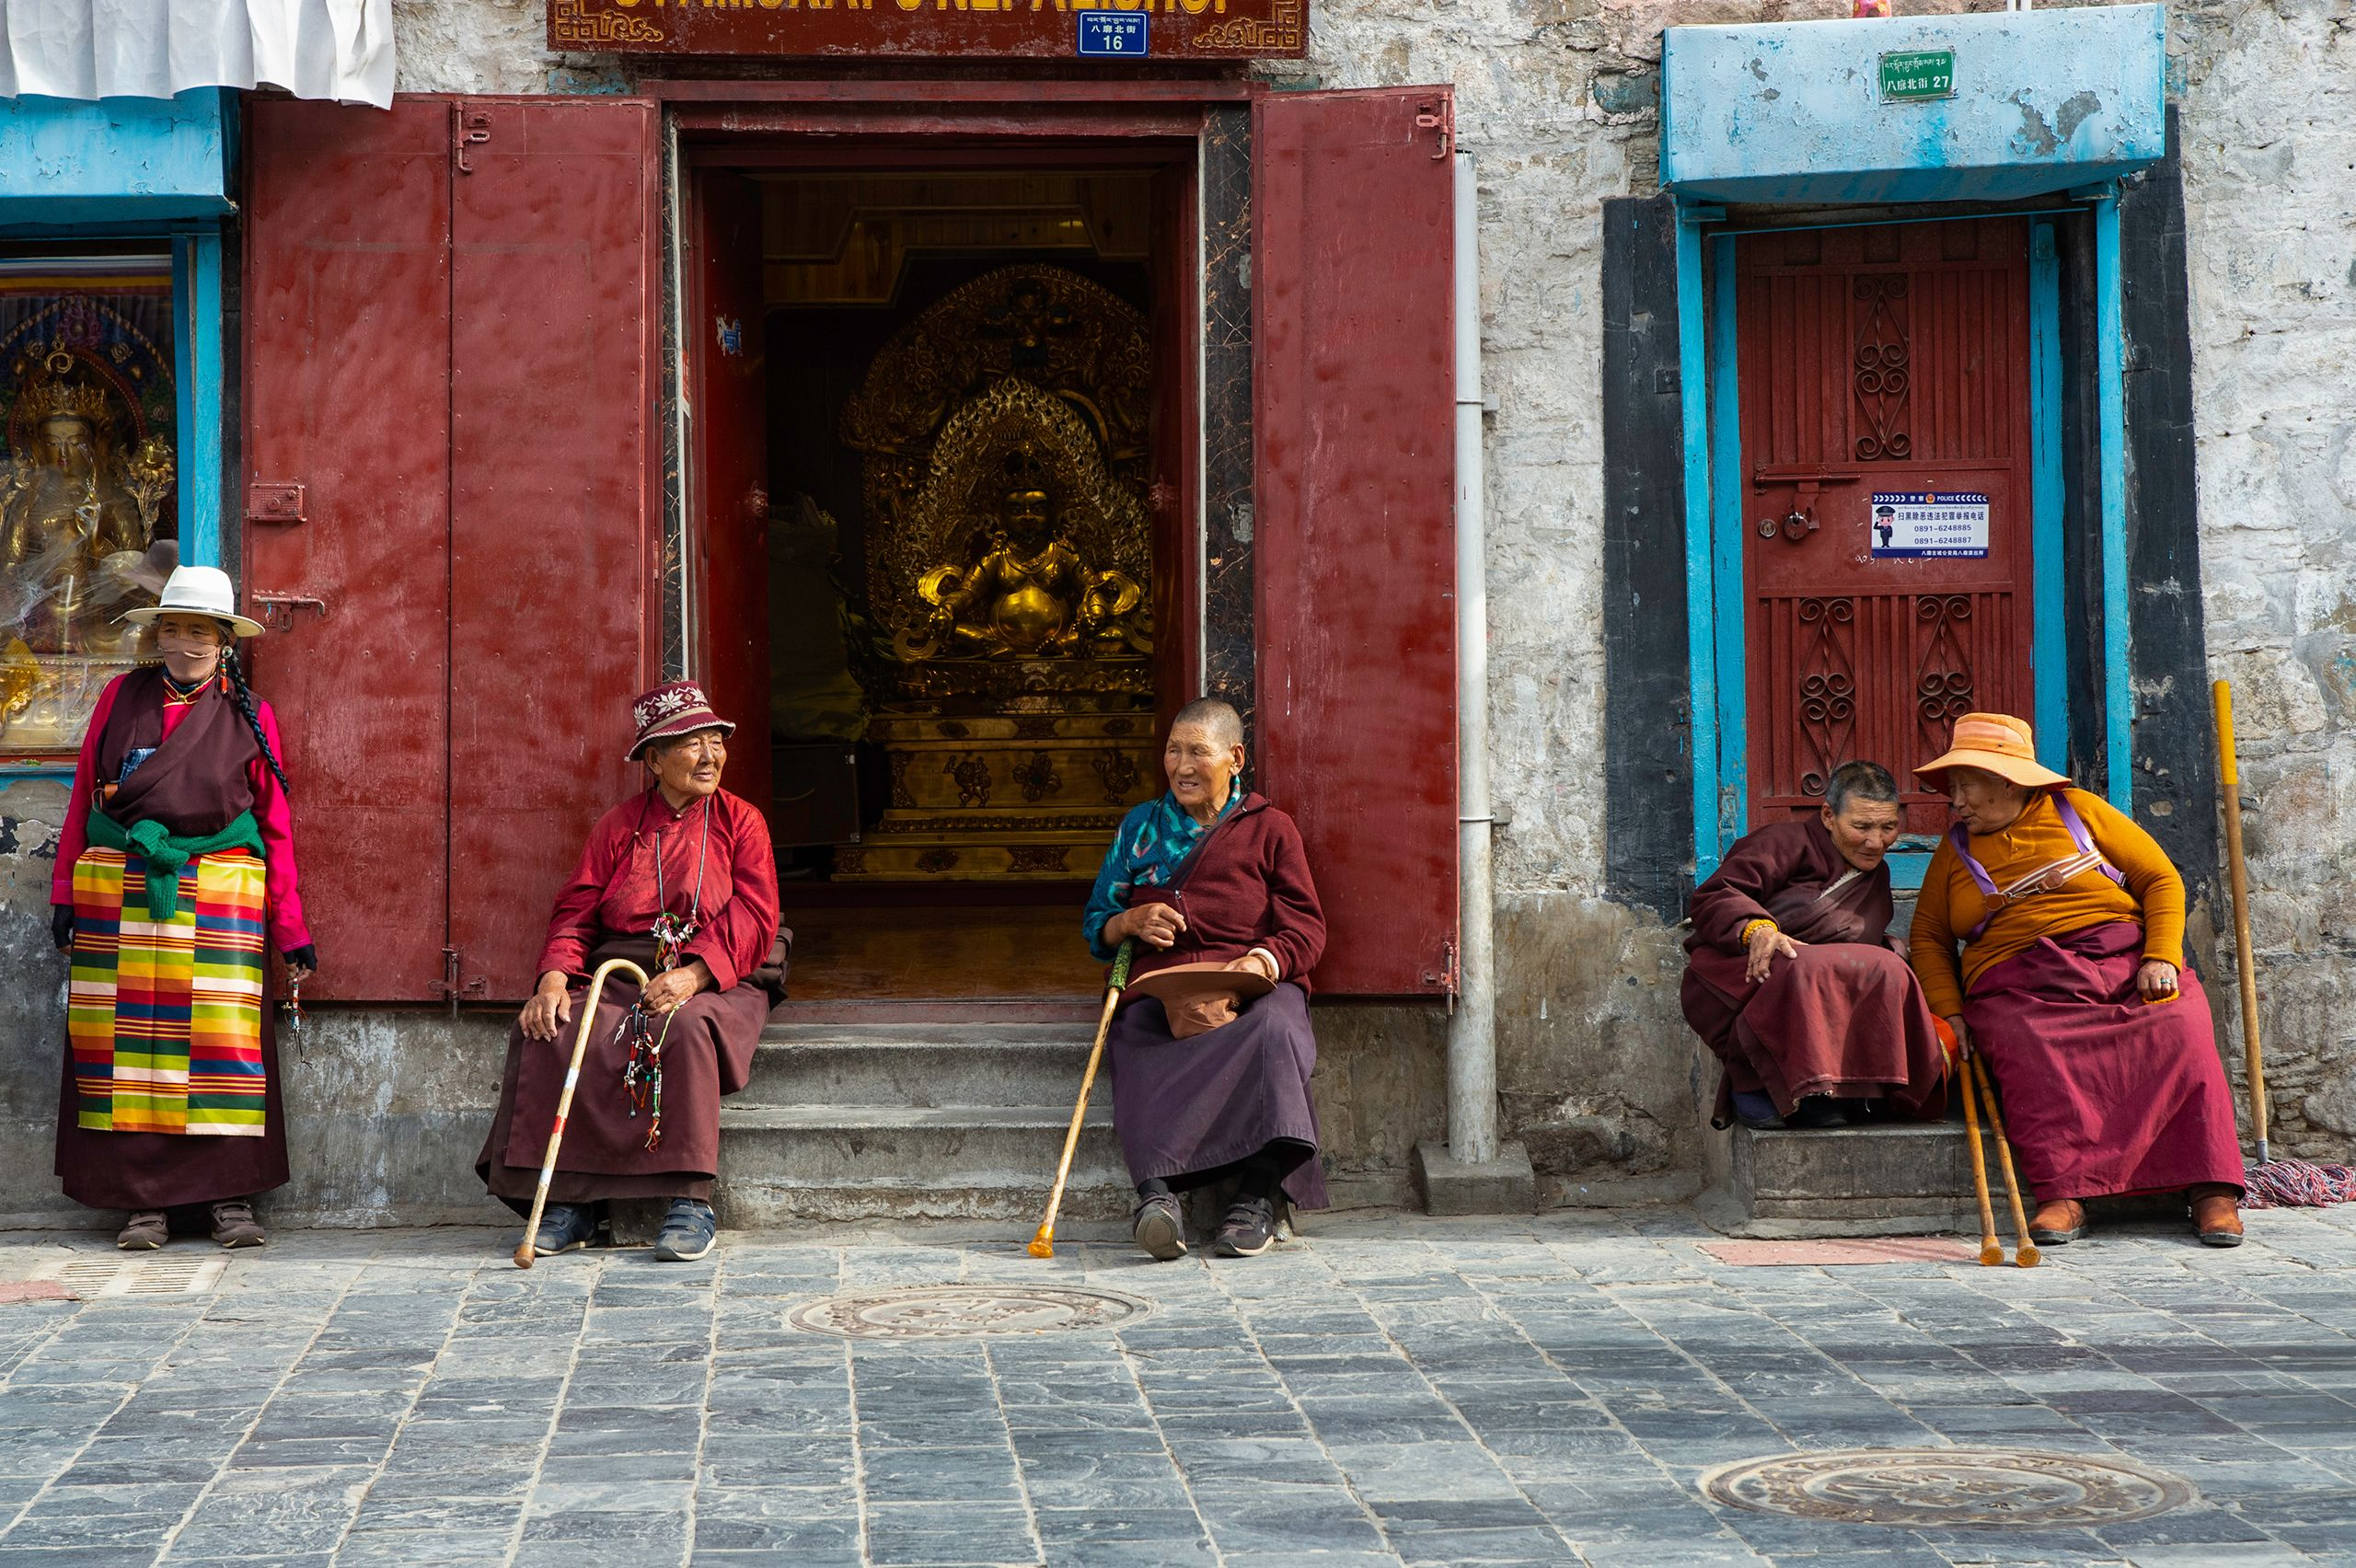 Lhasa_100-1.jpg